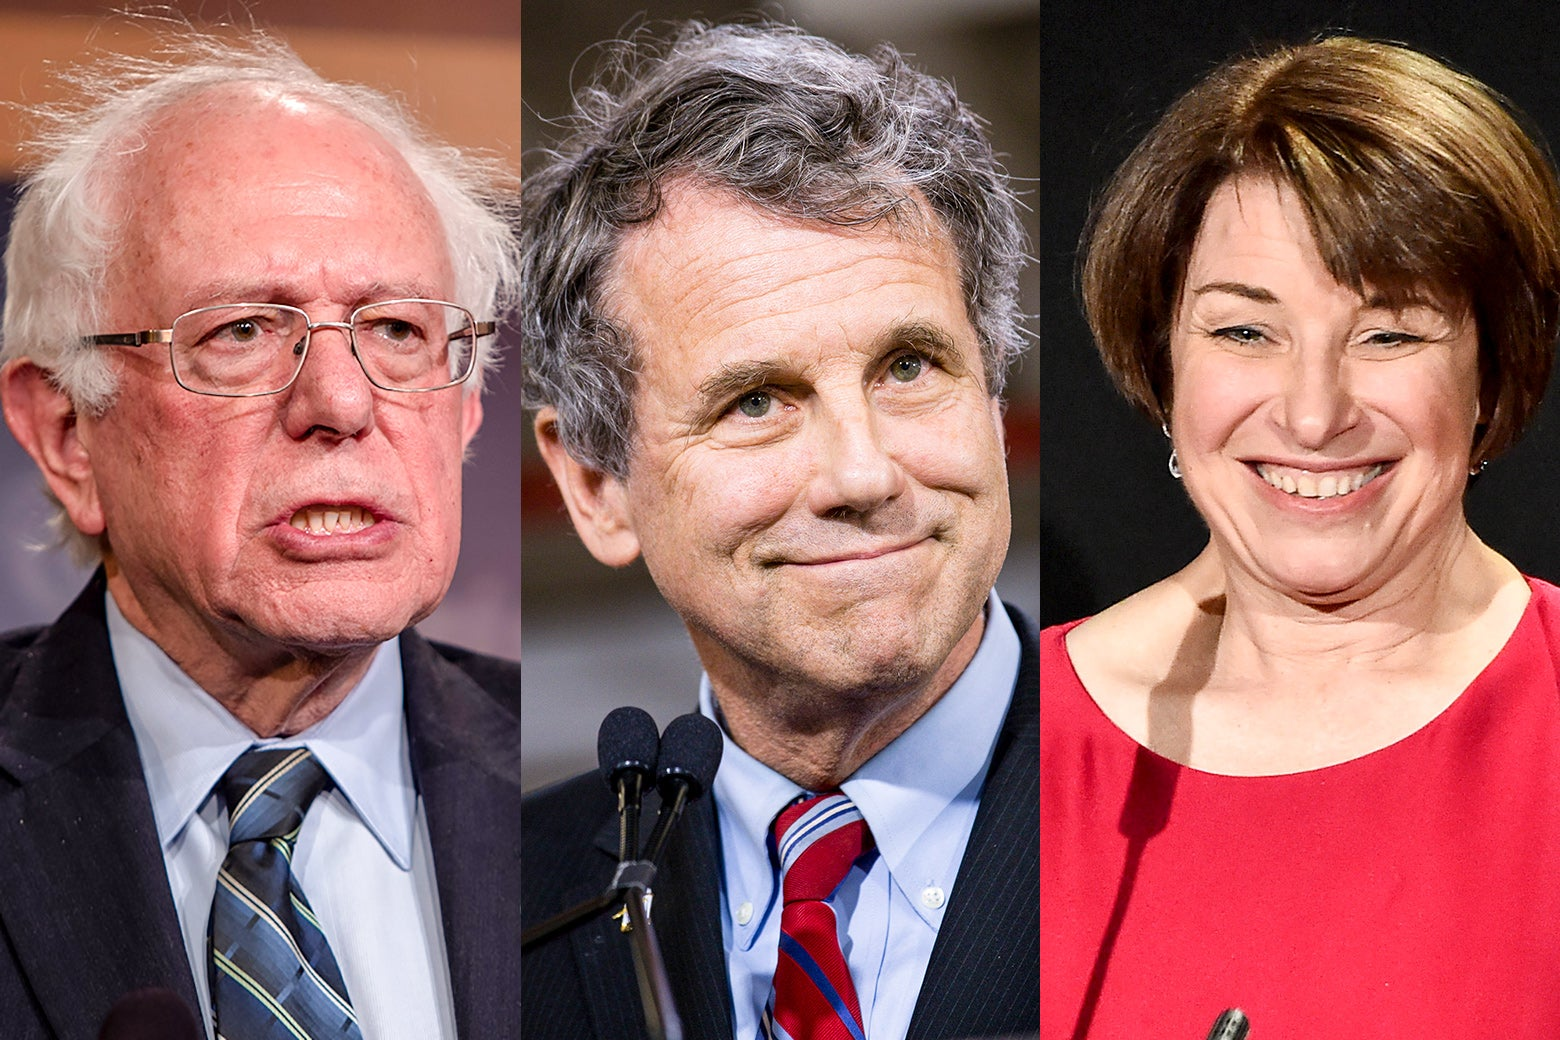 Bernie Sanders, Sherrod Brown, and Amy Klobuchar.